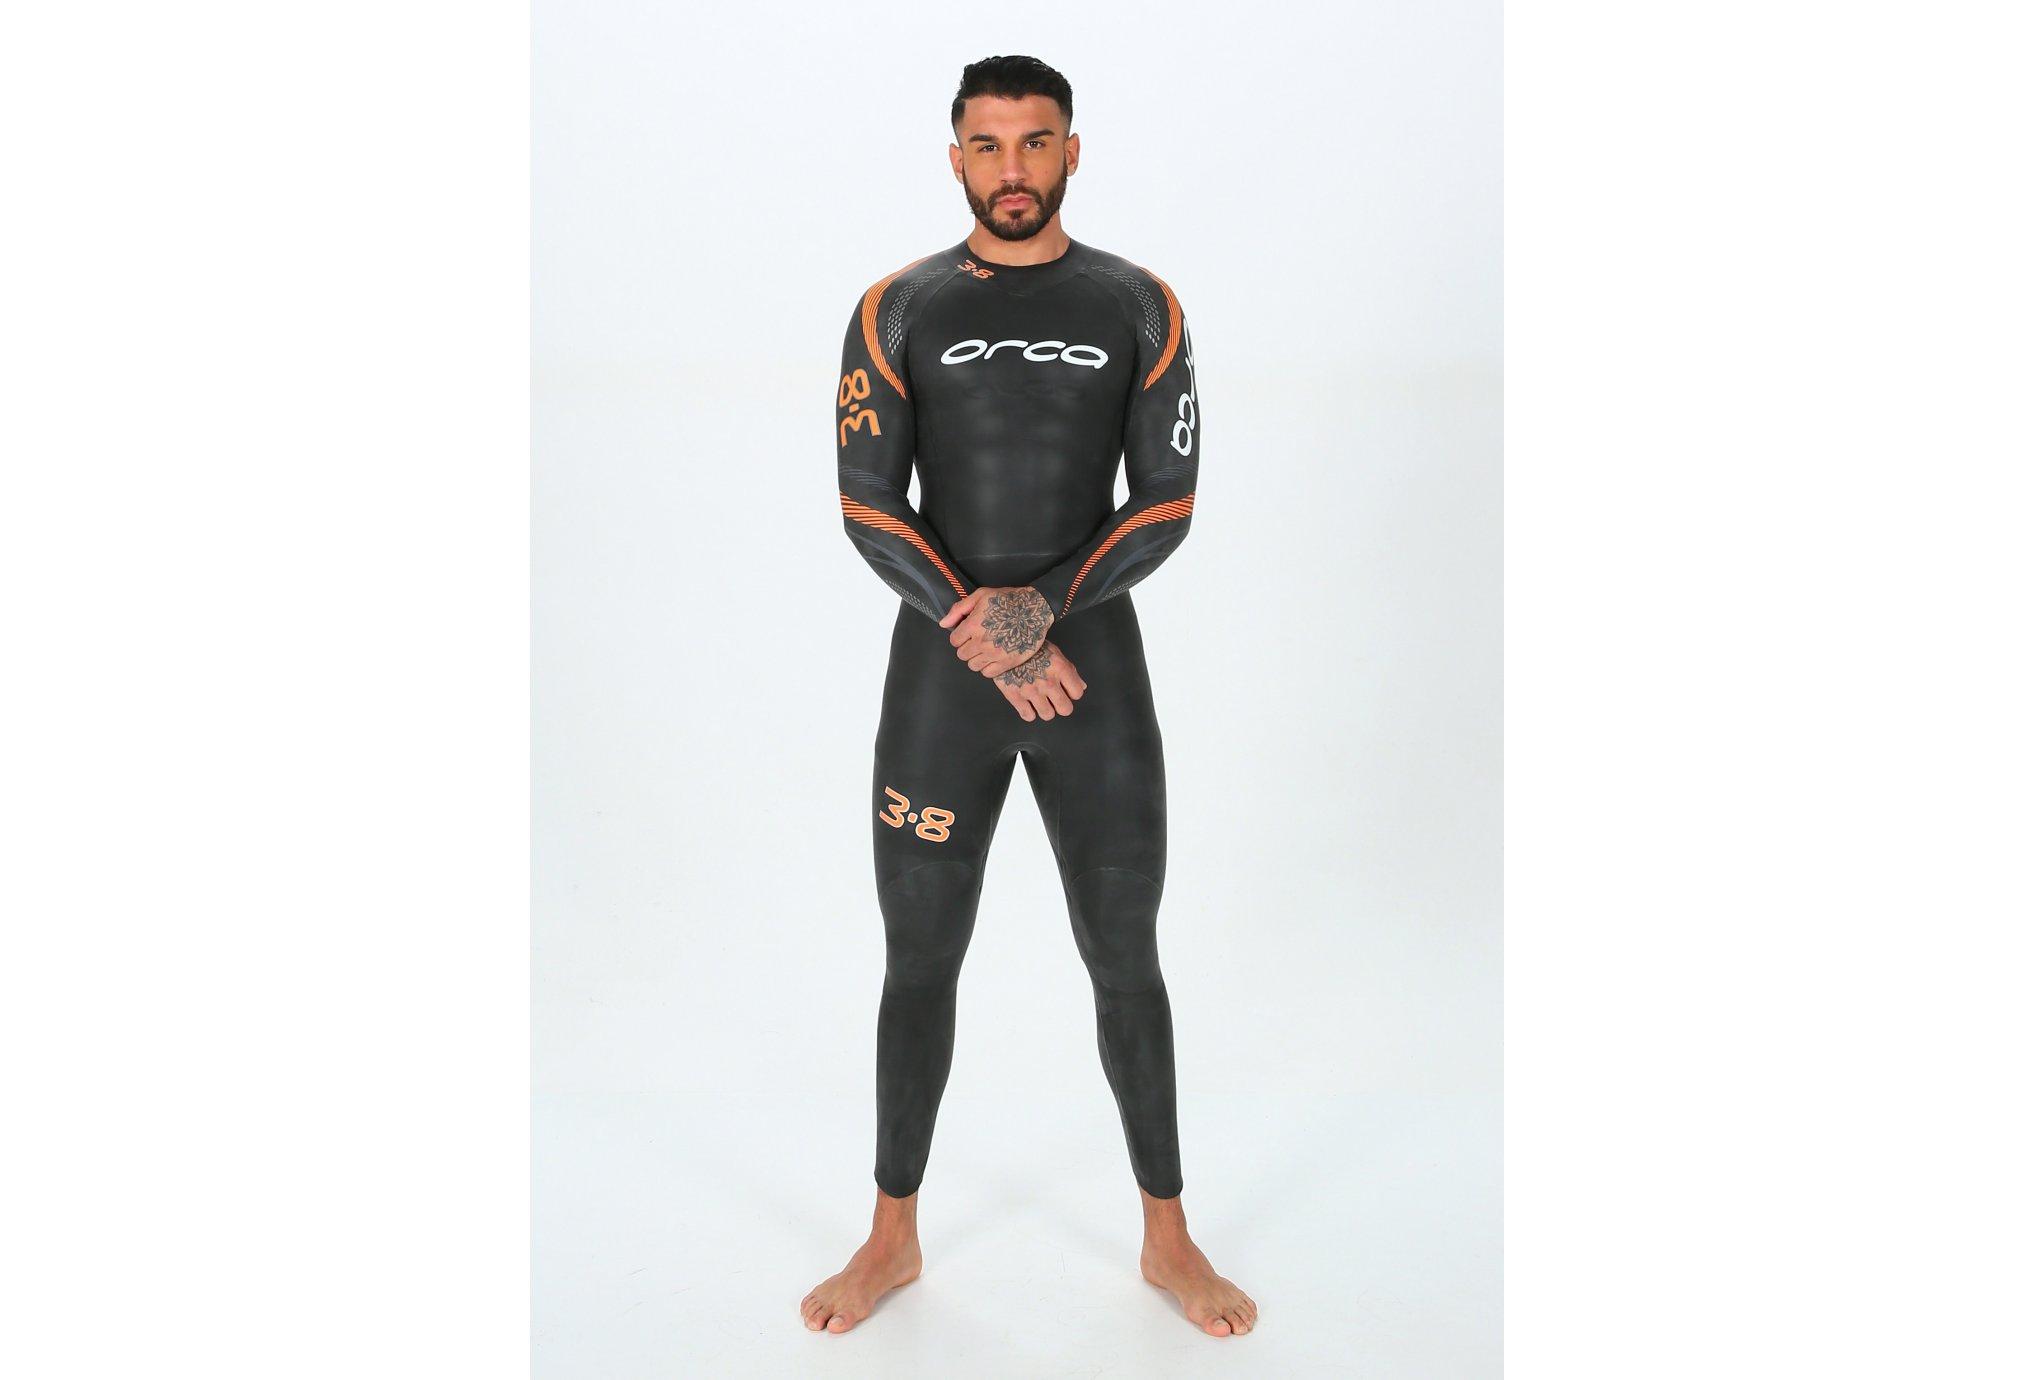 Orca 3.8 Enduro M vêtement running homme